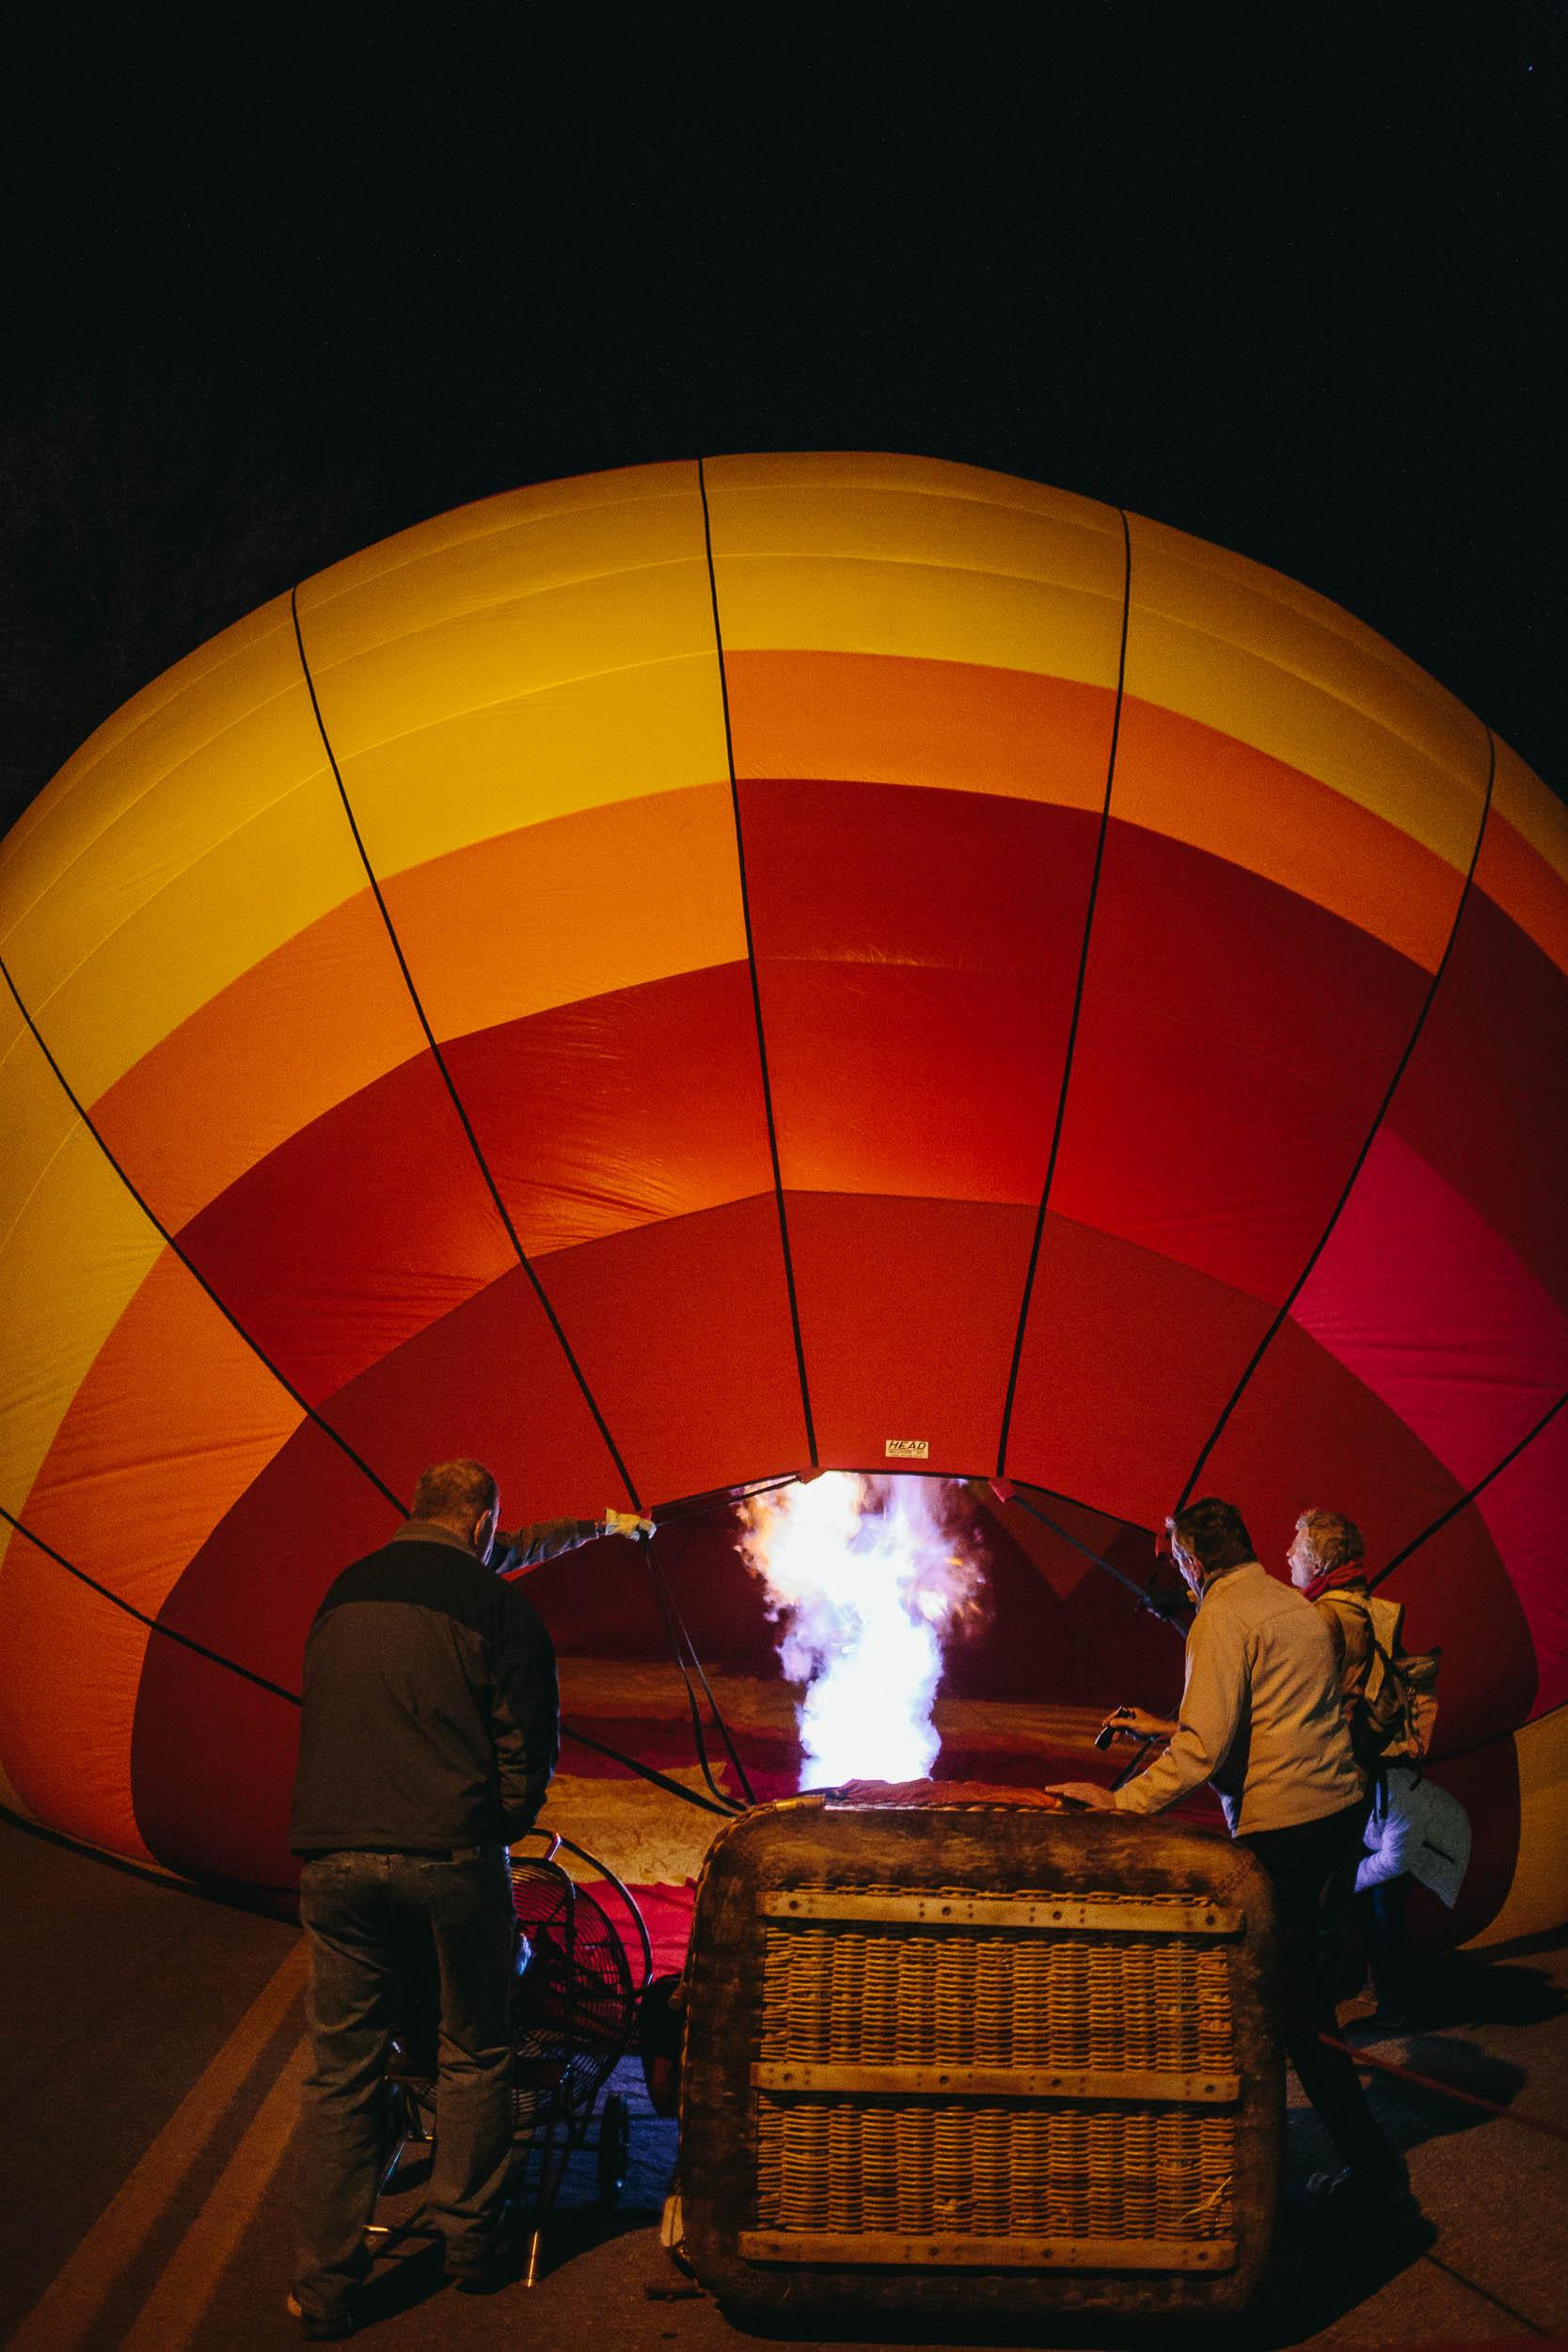 Kyle-Sheppard-Kanab-Balloon-Festival-46.jpg